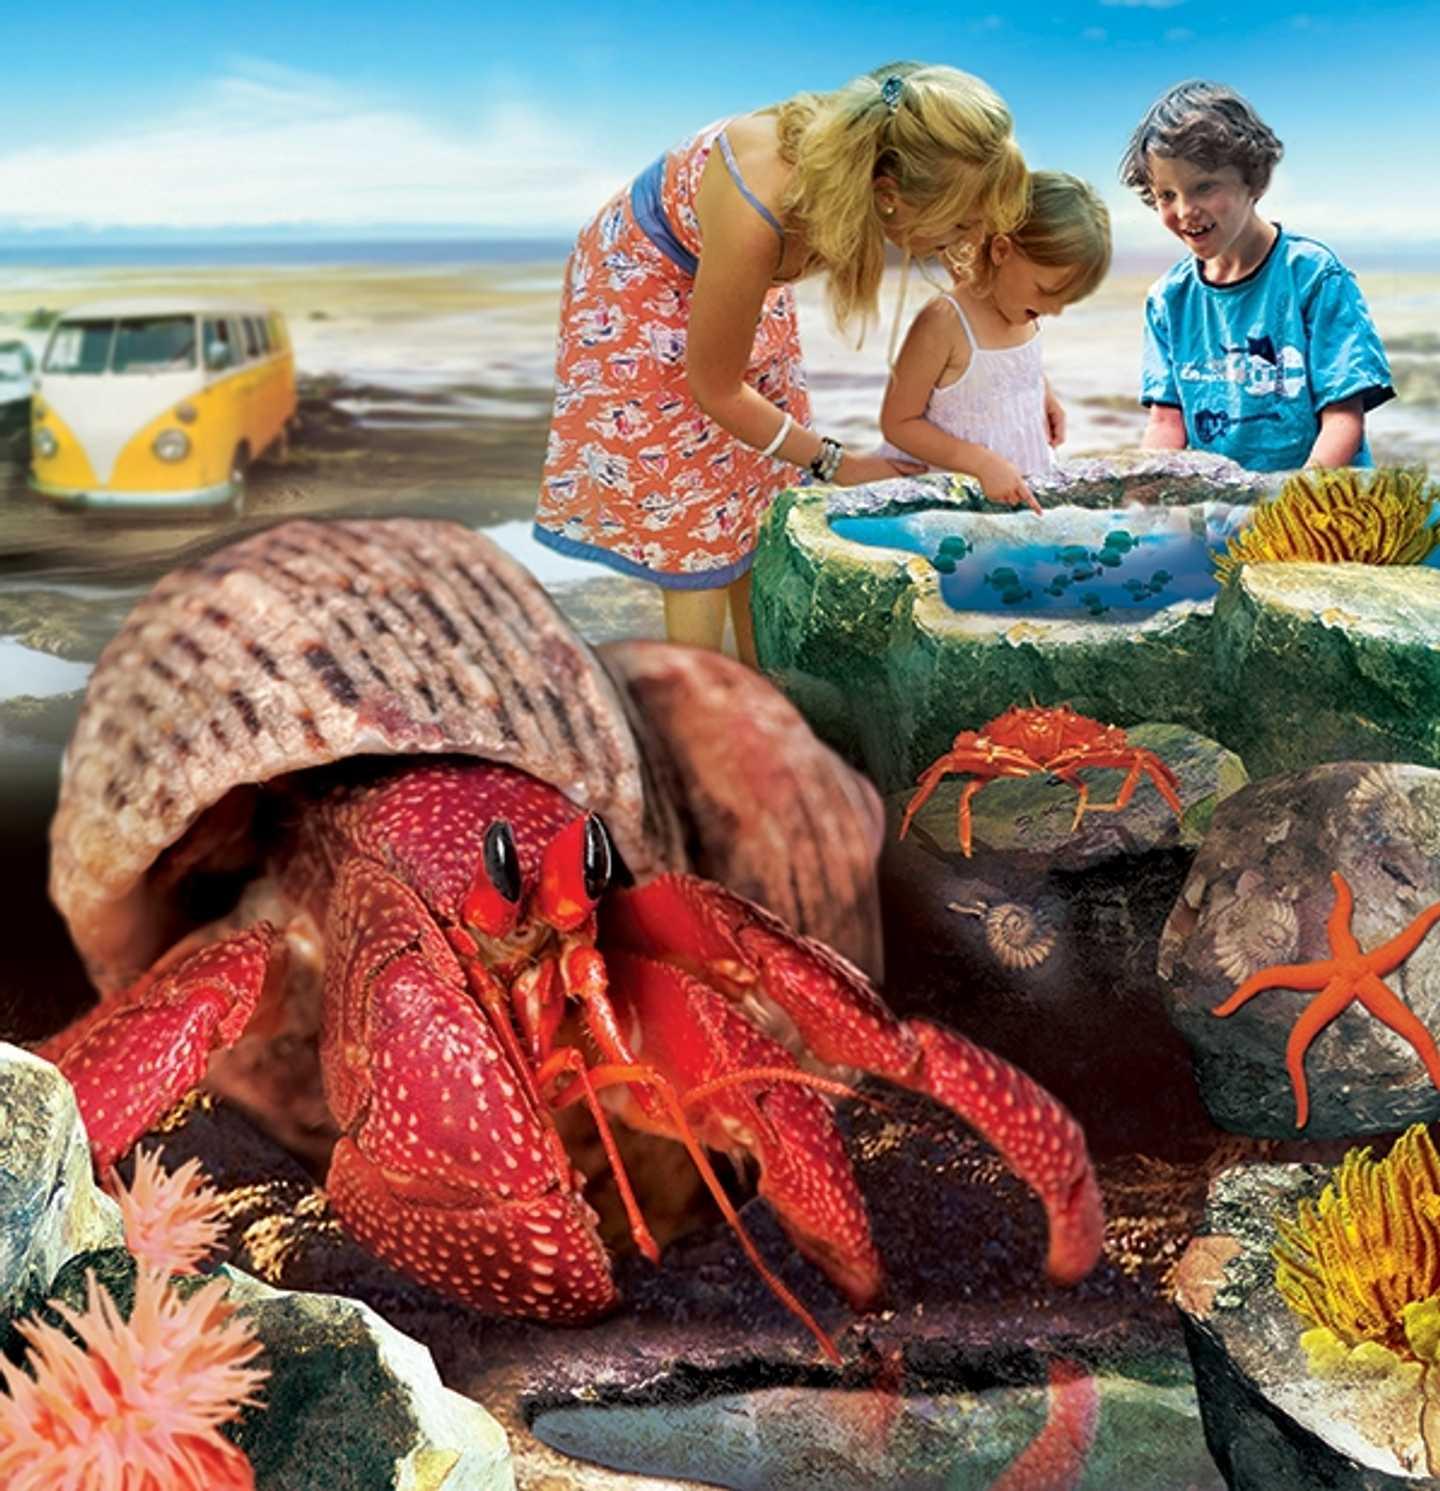 Anglesea Sea Zoo